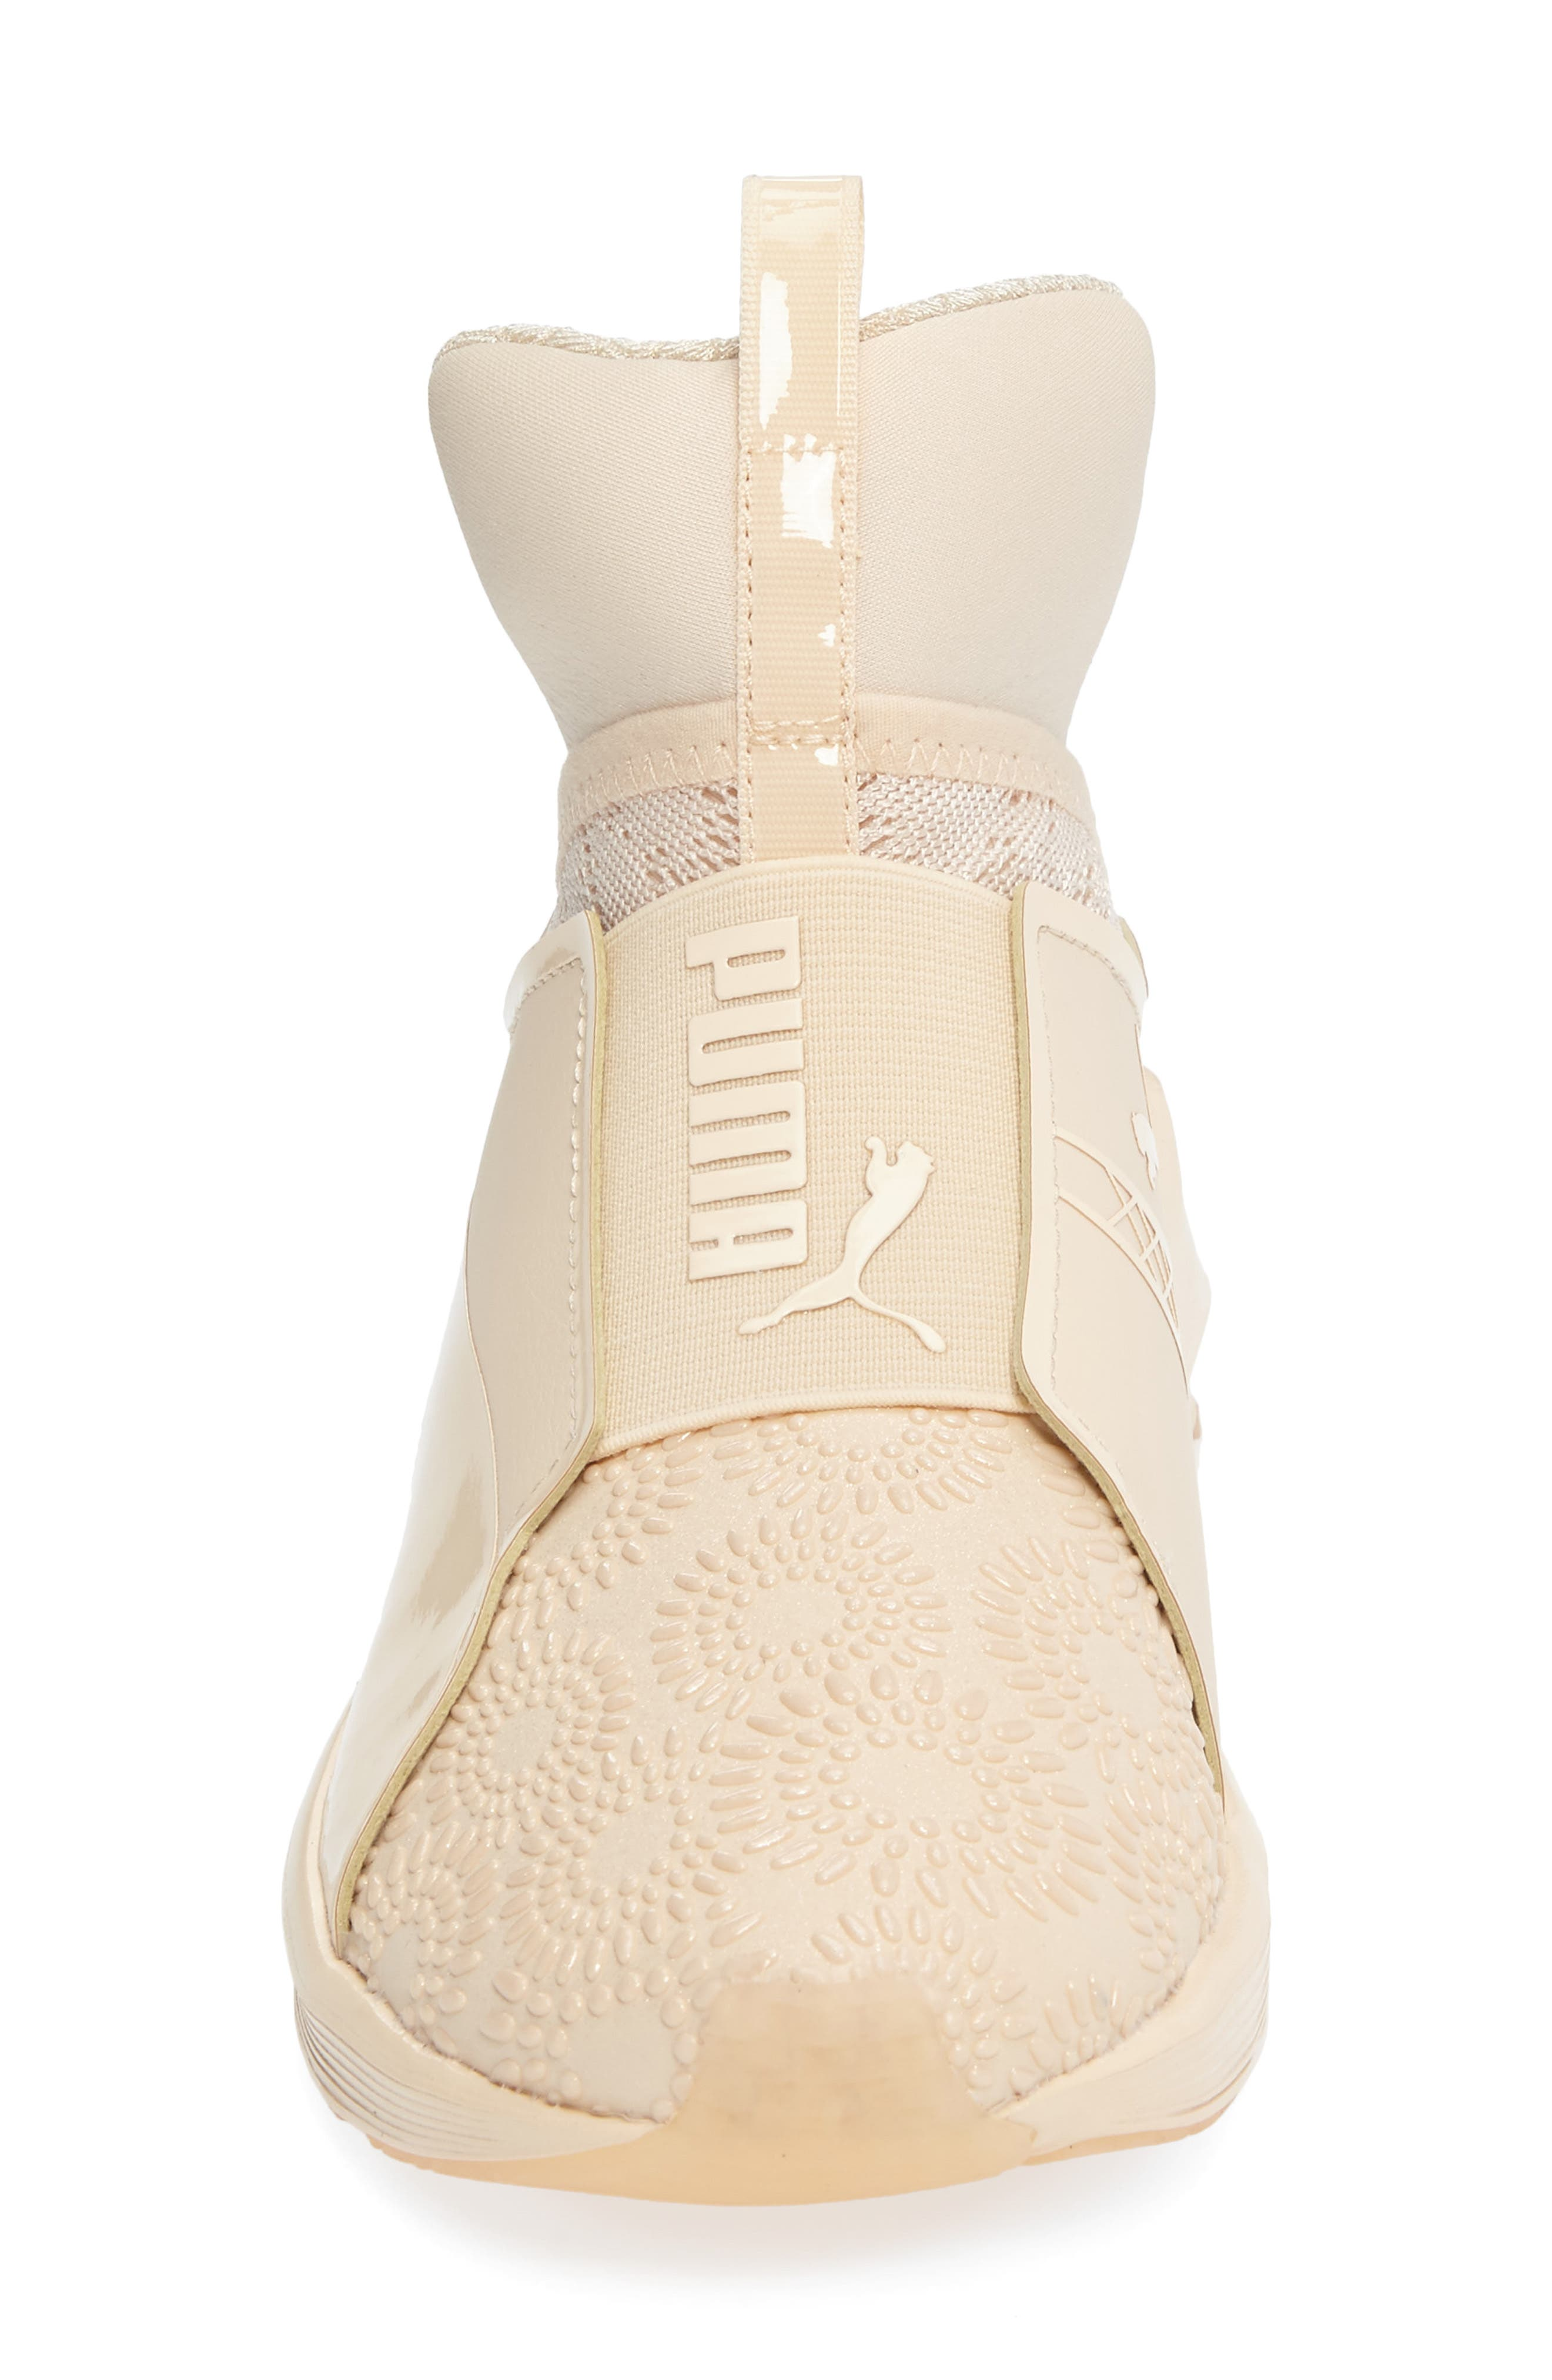 Fierce KRM High Top Sneaker,                             Alternate thumbnail 8, color,